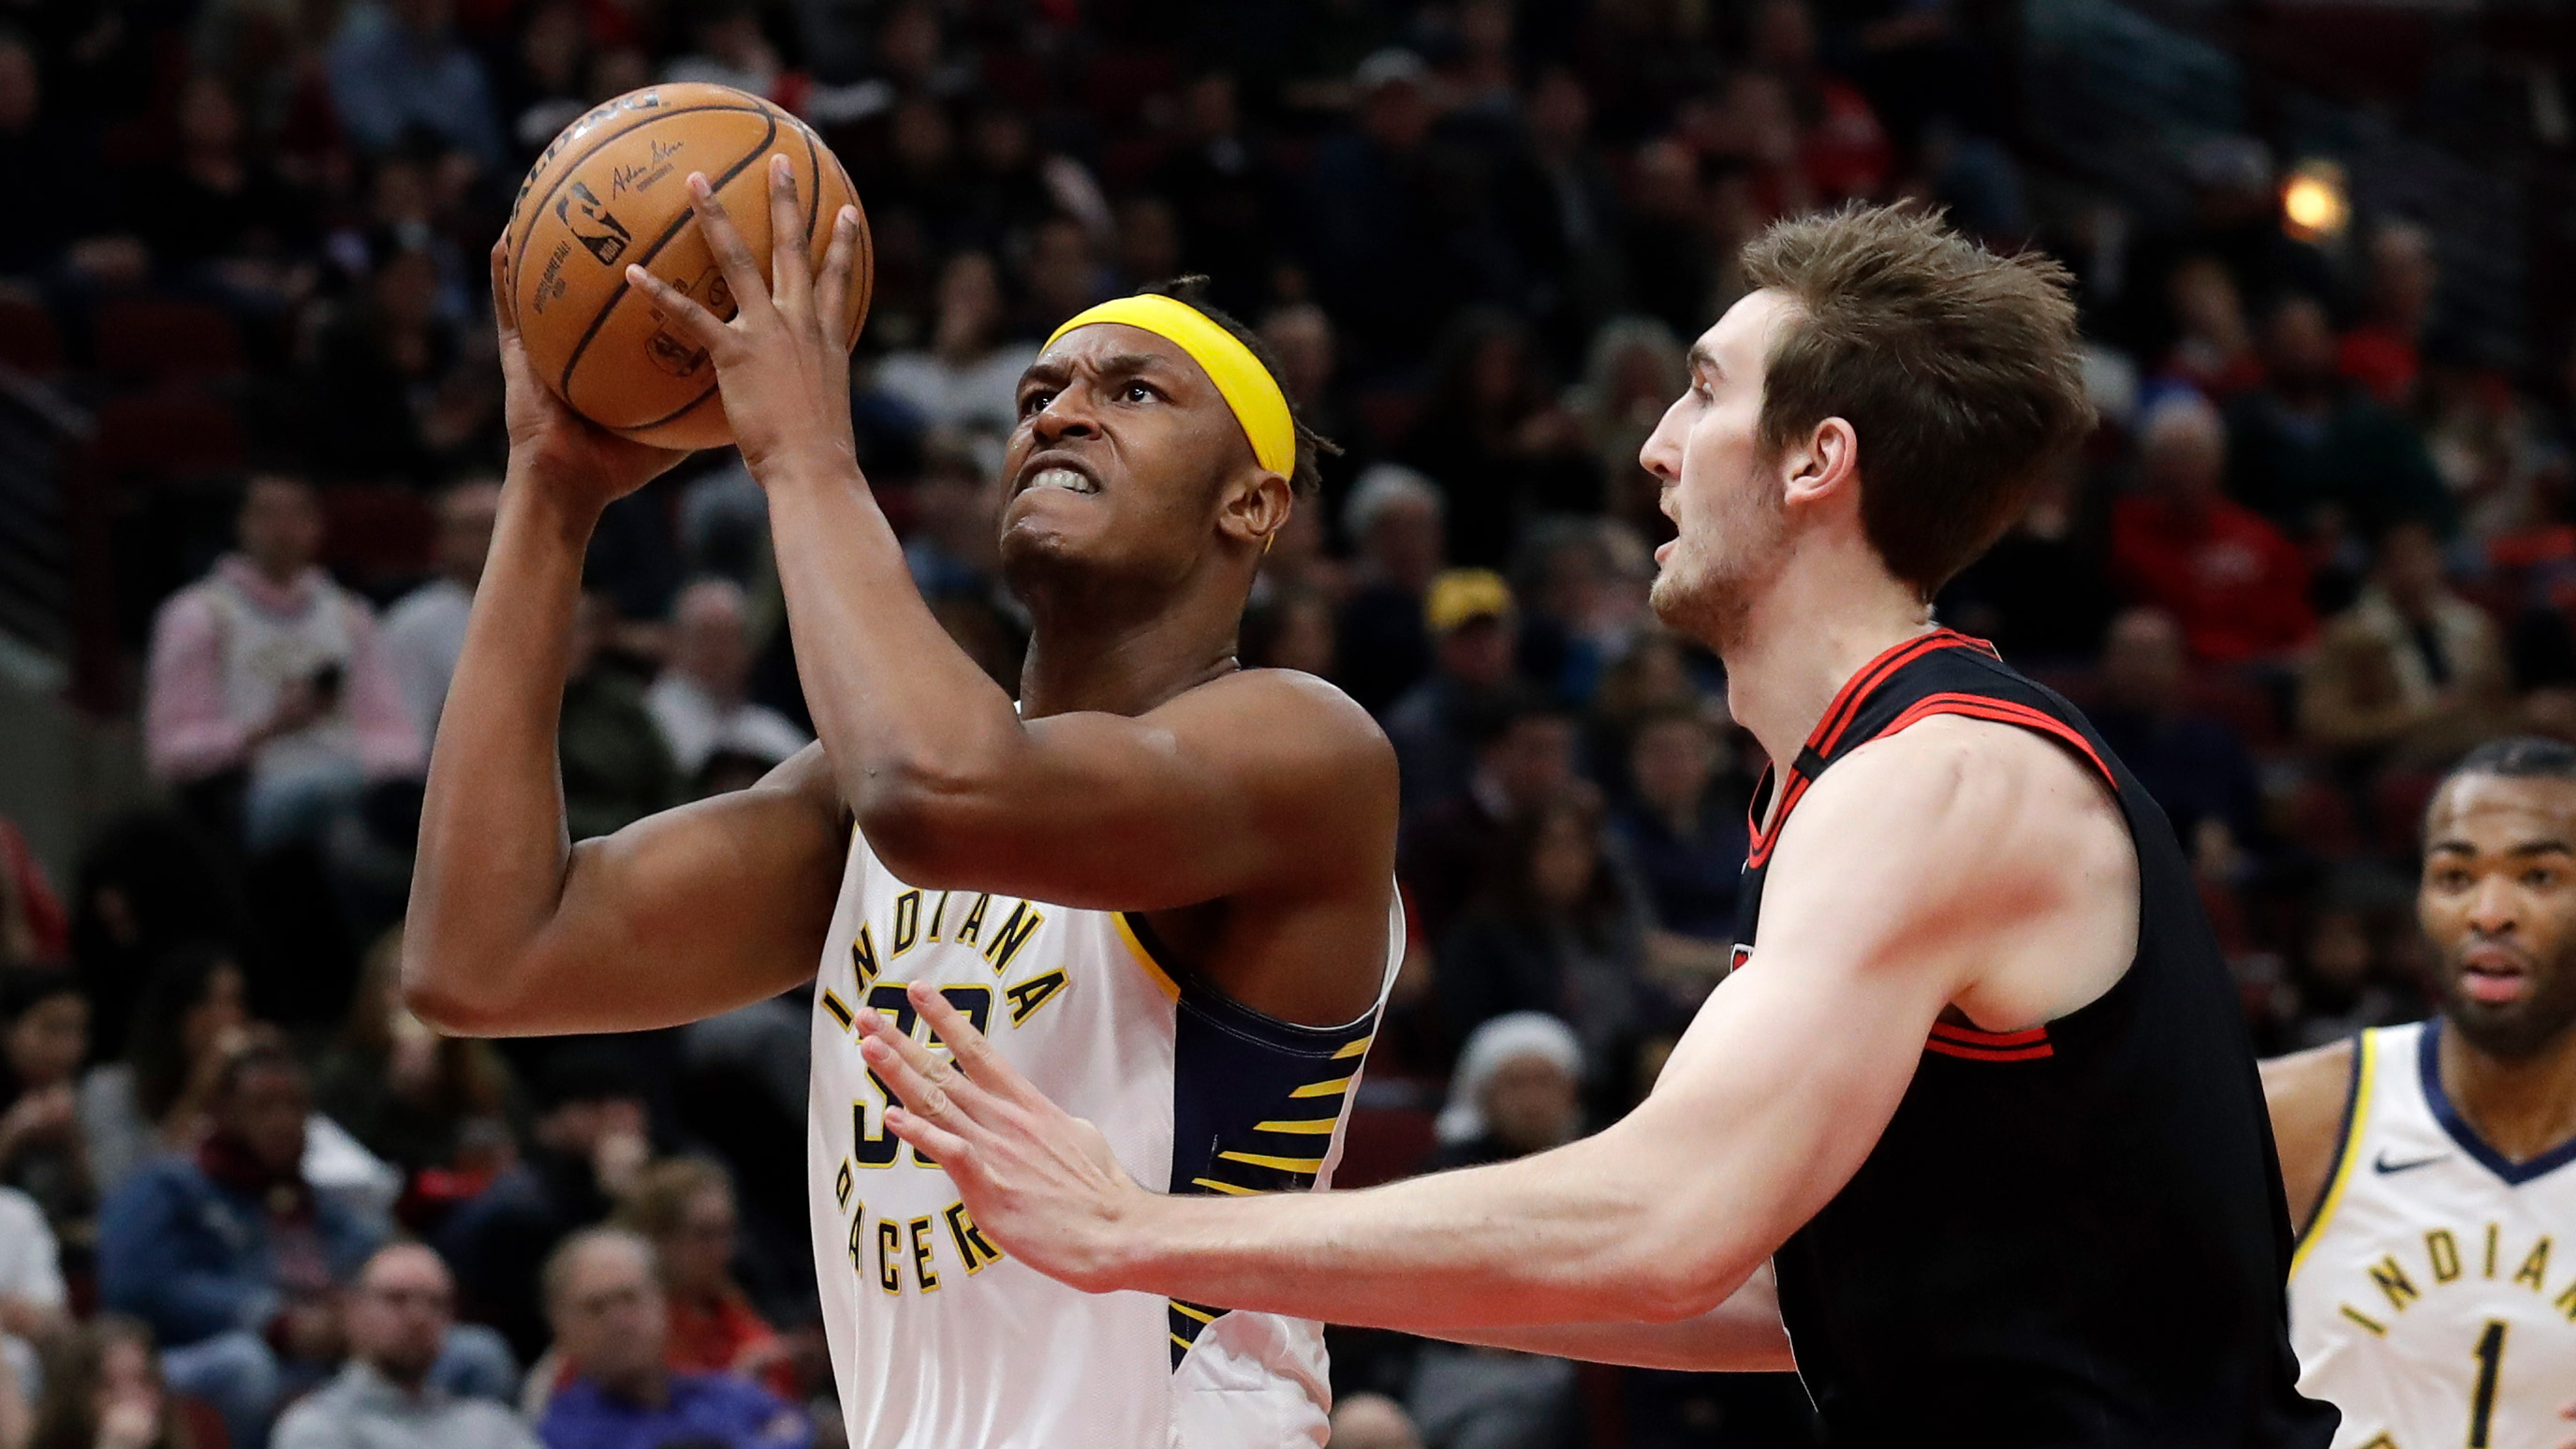 Turner scores season-high 27 as Pacers top Bulls 116-105